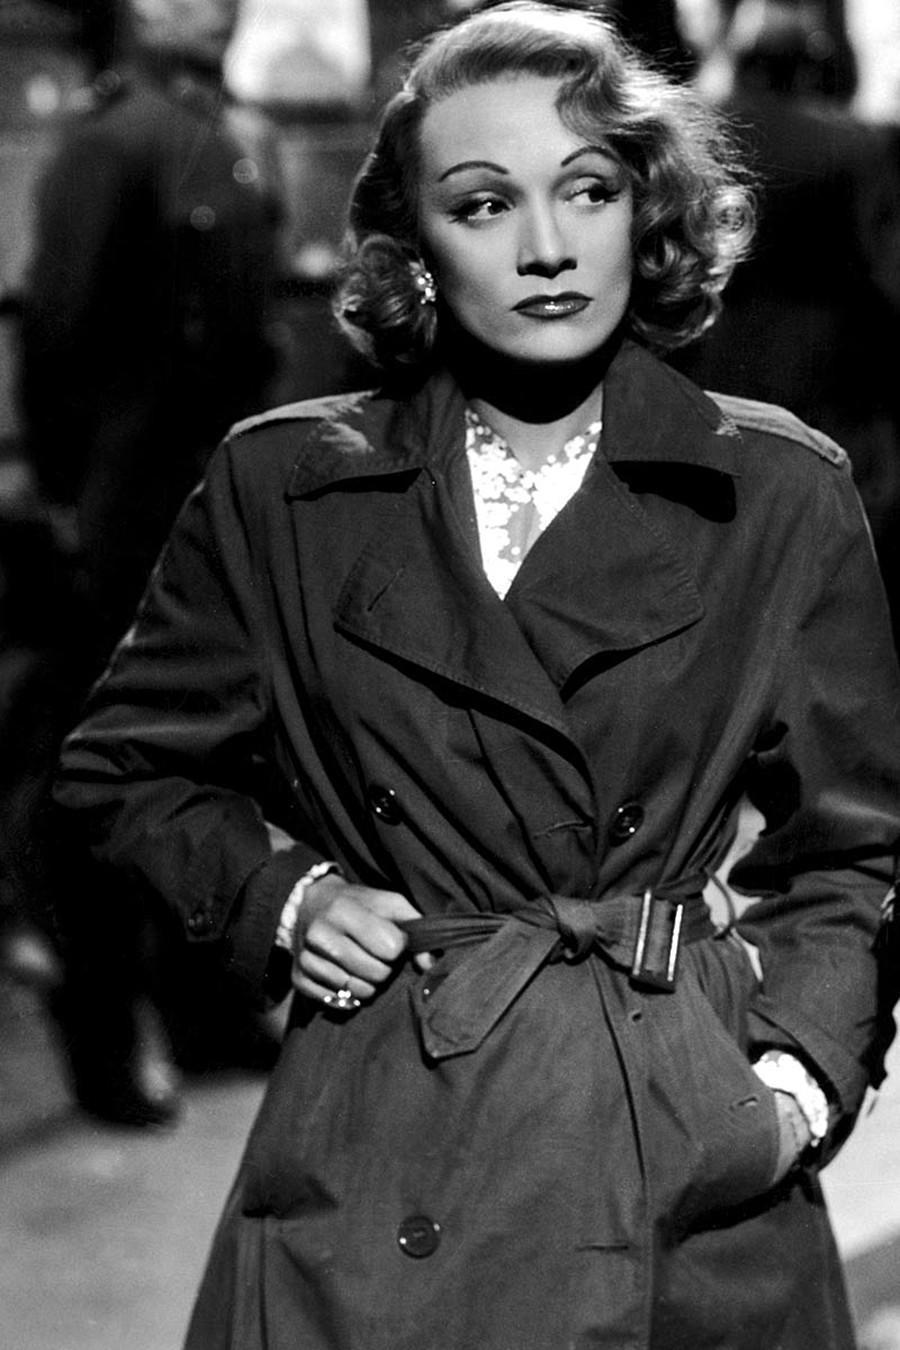 Marlene Dietrich portant un trench-coat